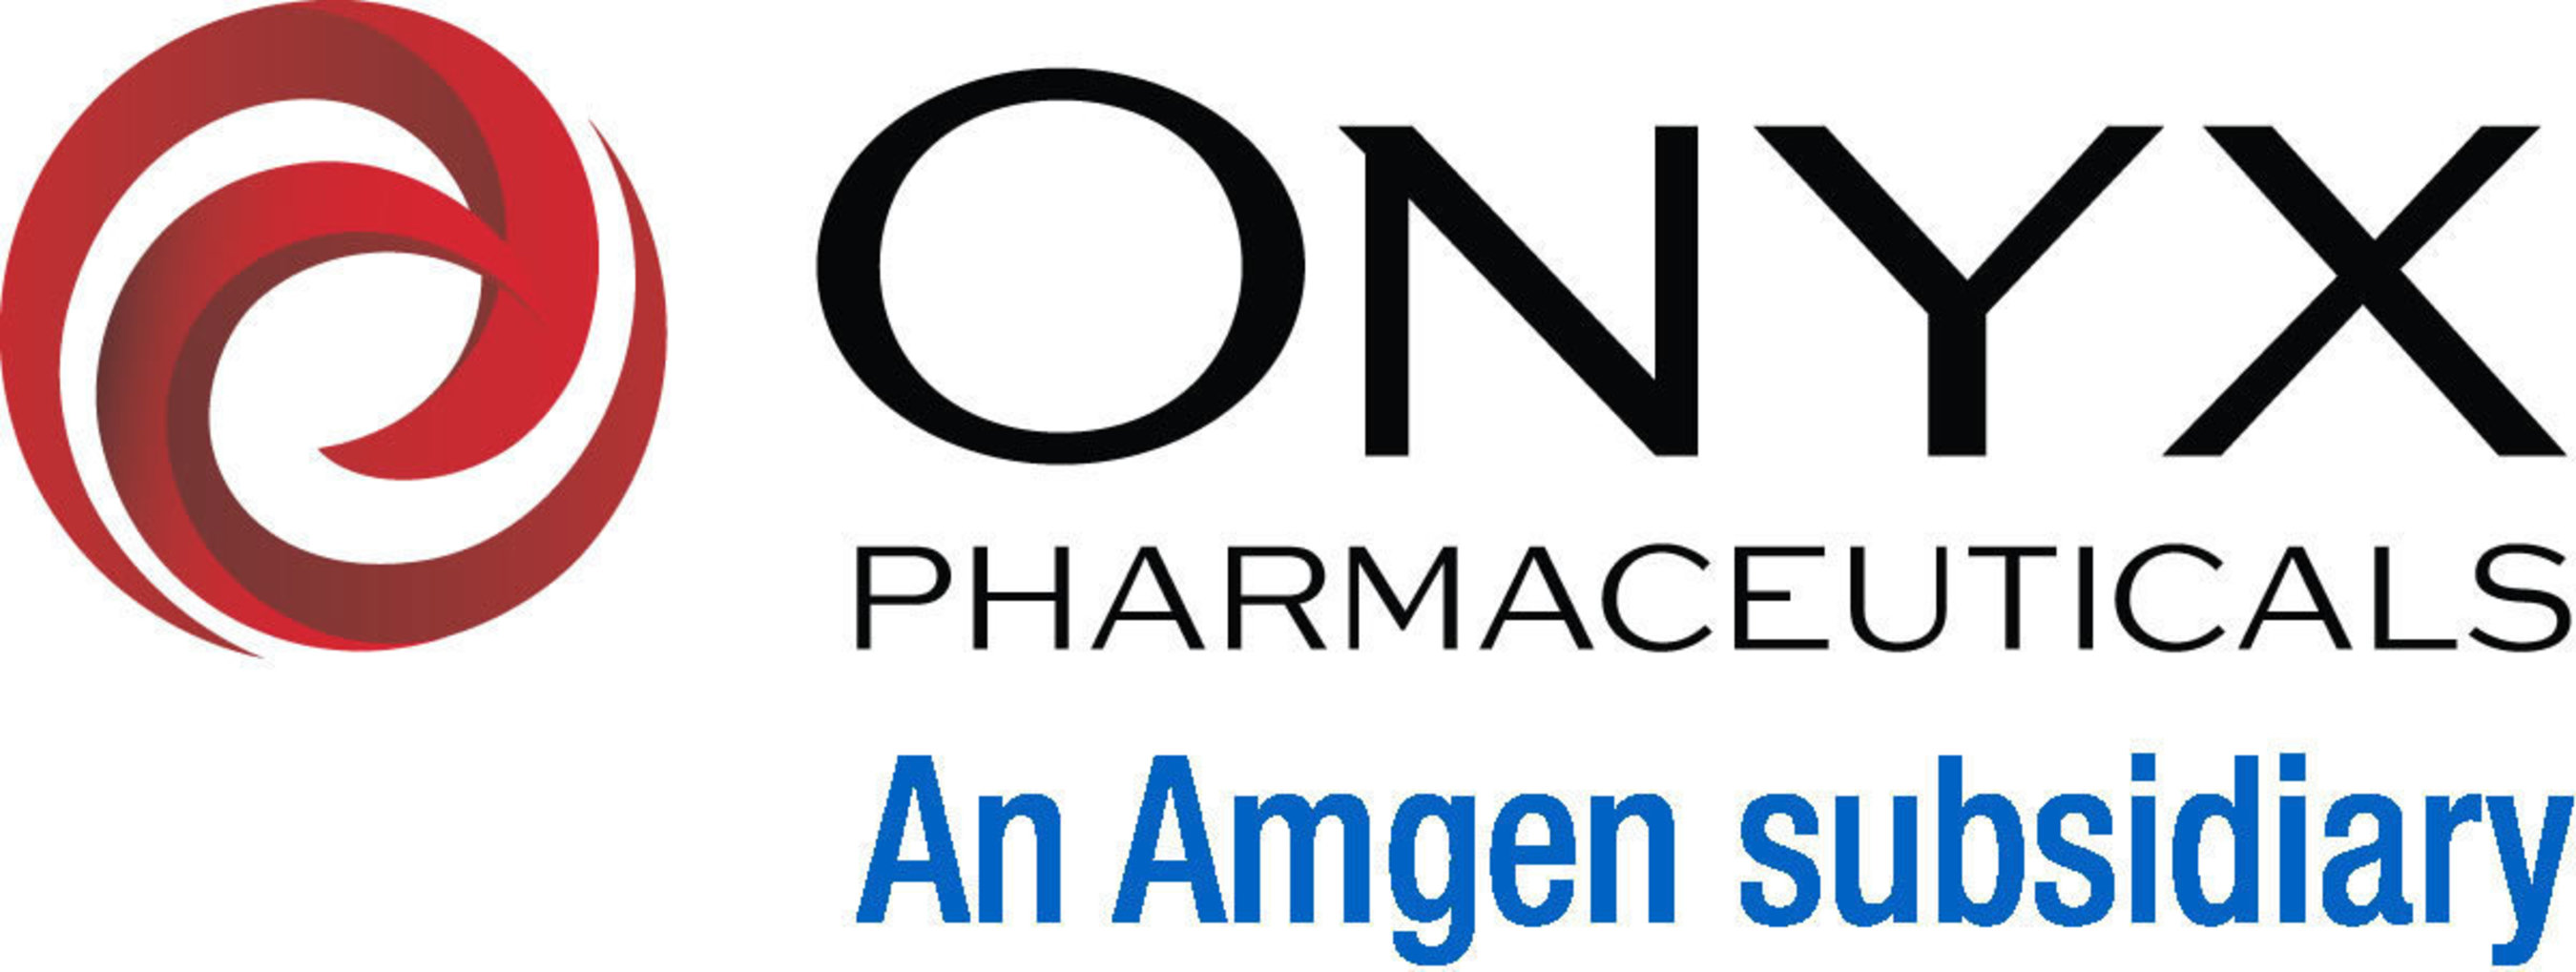 Onyx Pharmaceuticals An Amgen subsidiary logo (PRNewsFoto/Bayer HealthCare Pharmaceuticals)